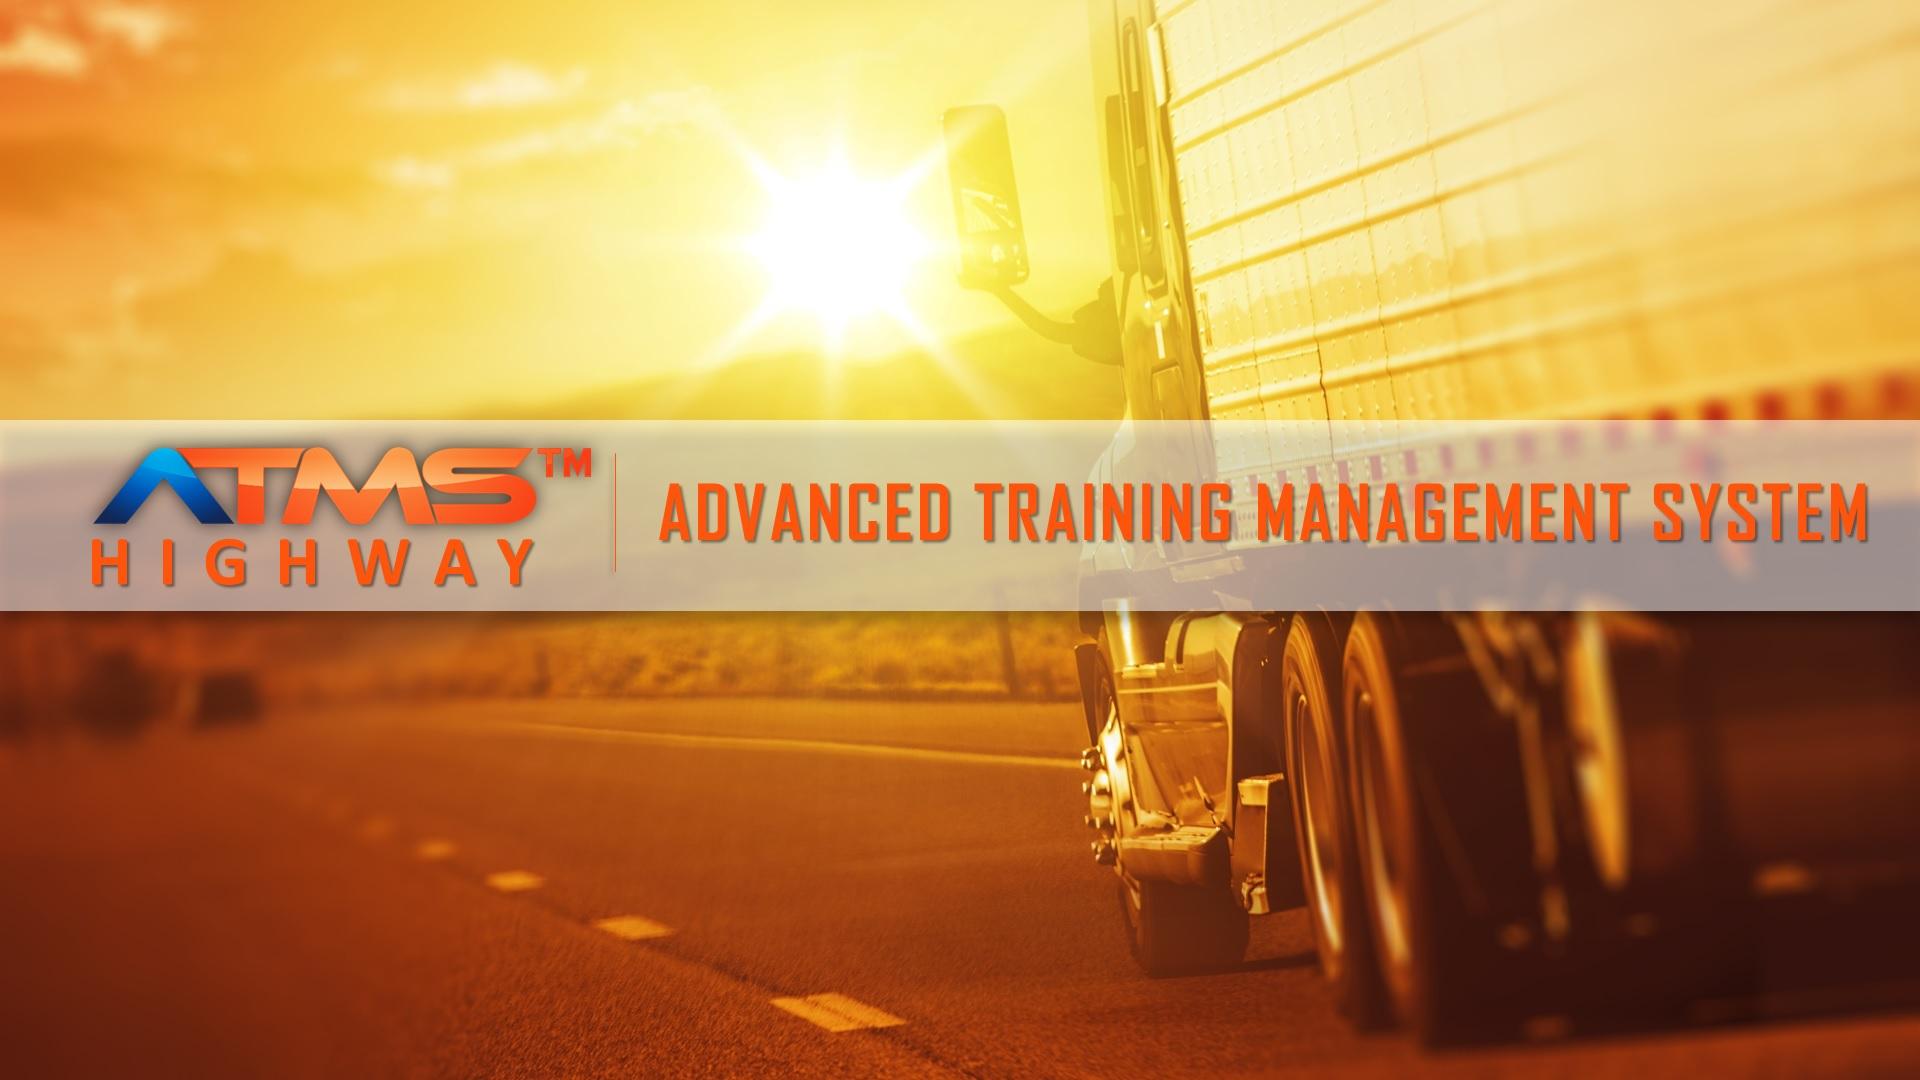 Highway-Training-System-Slide-1